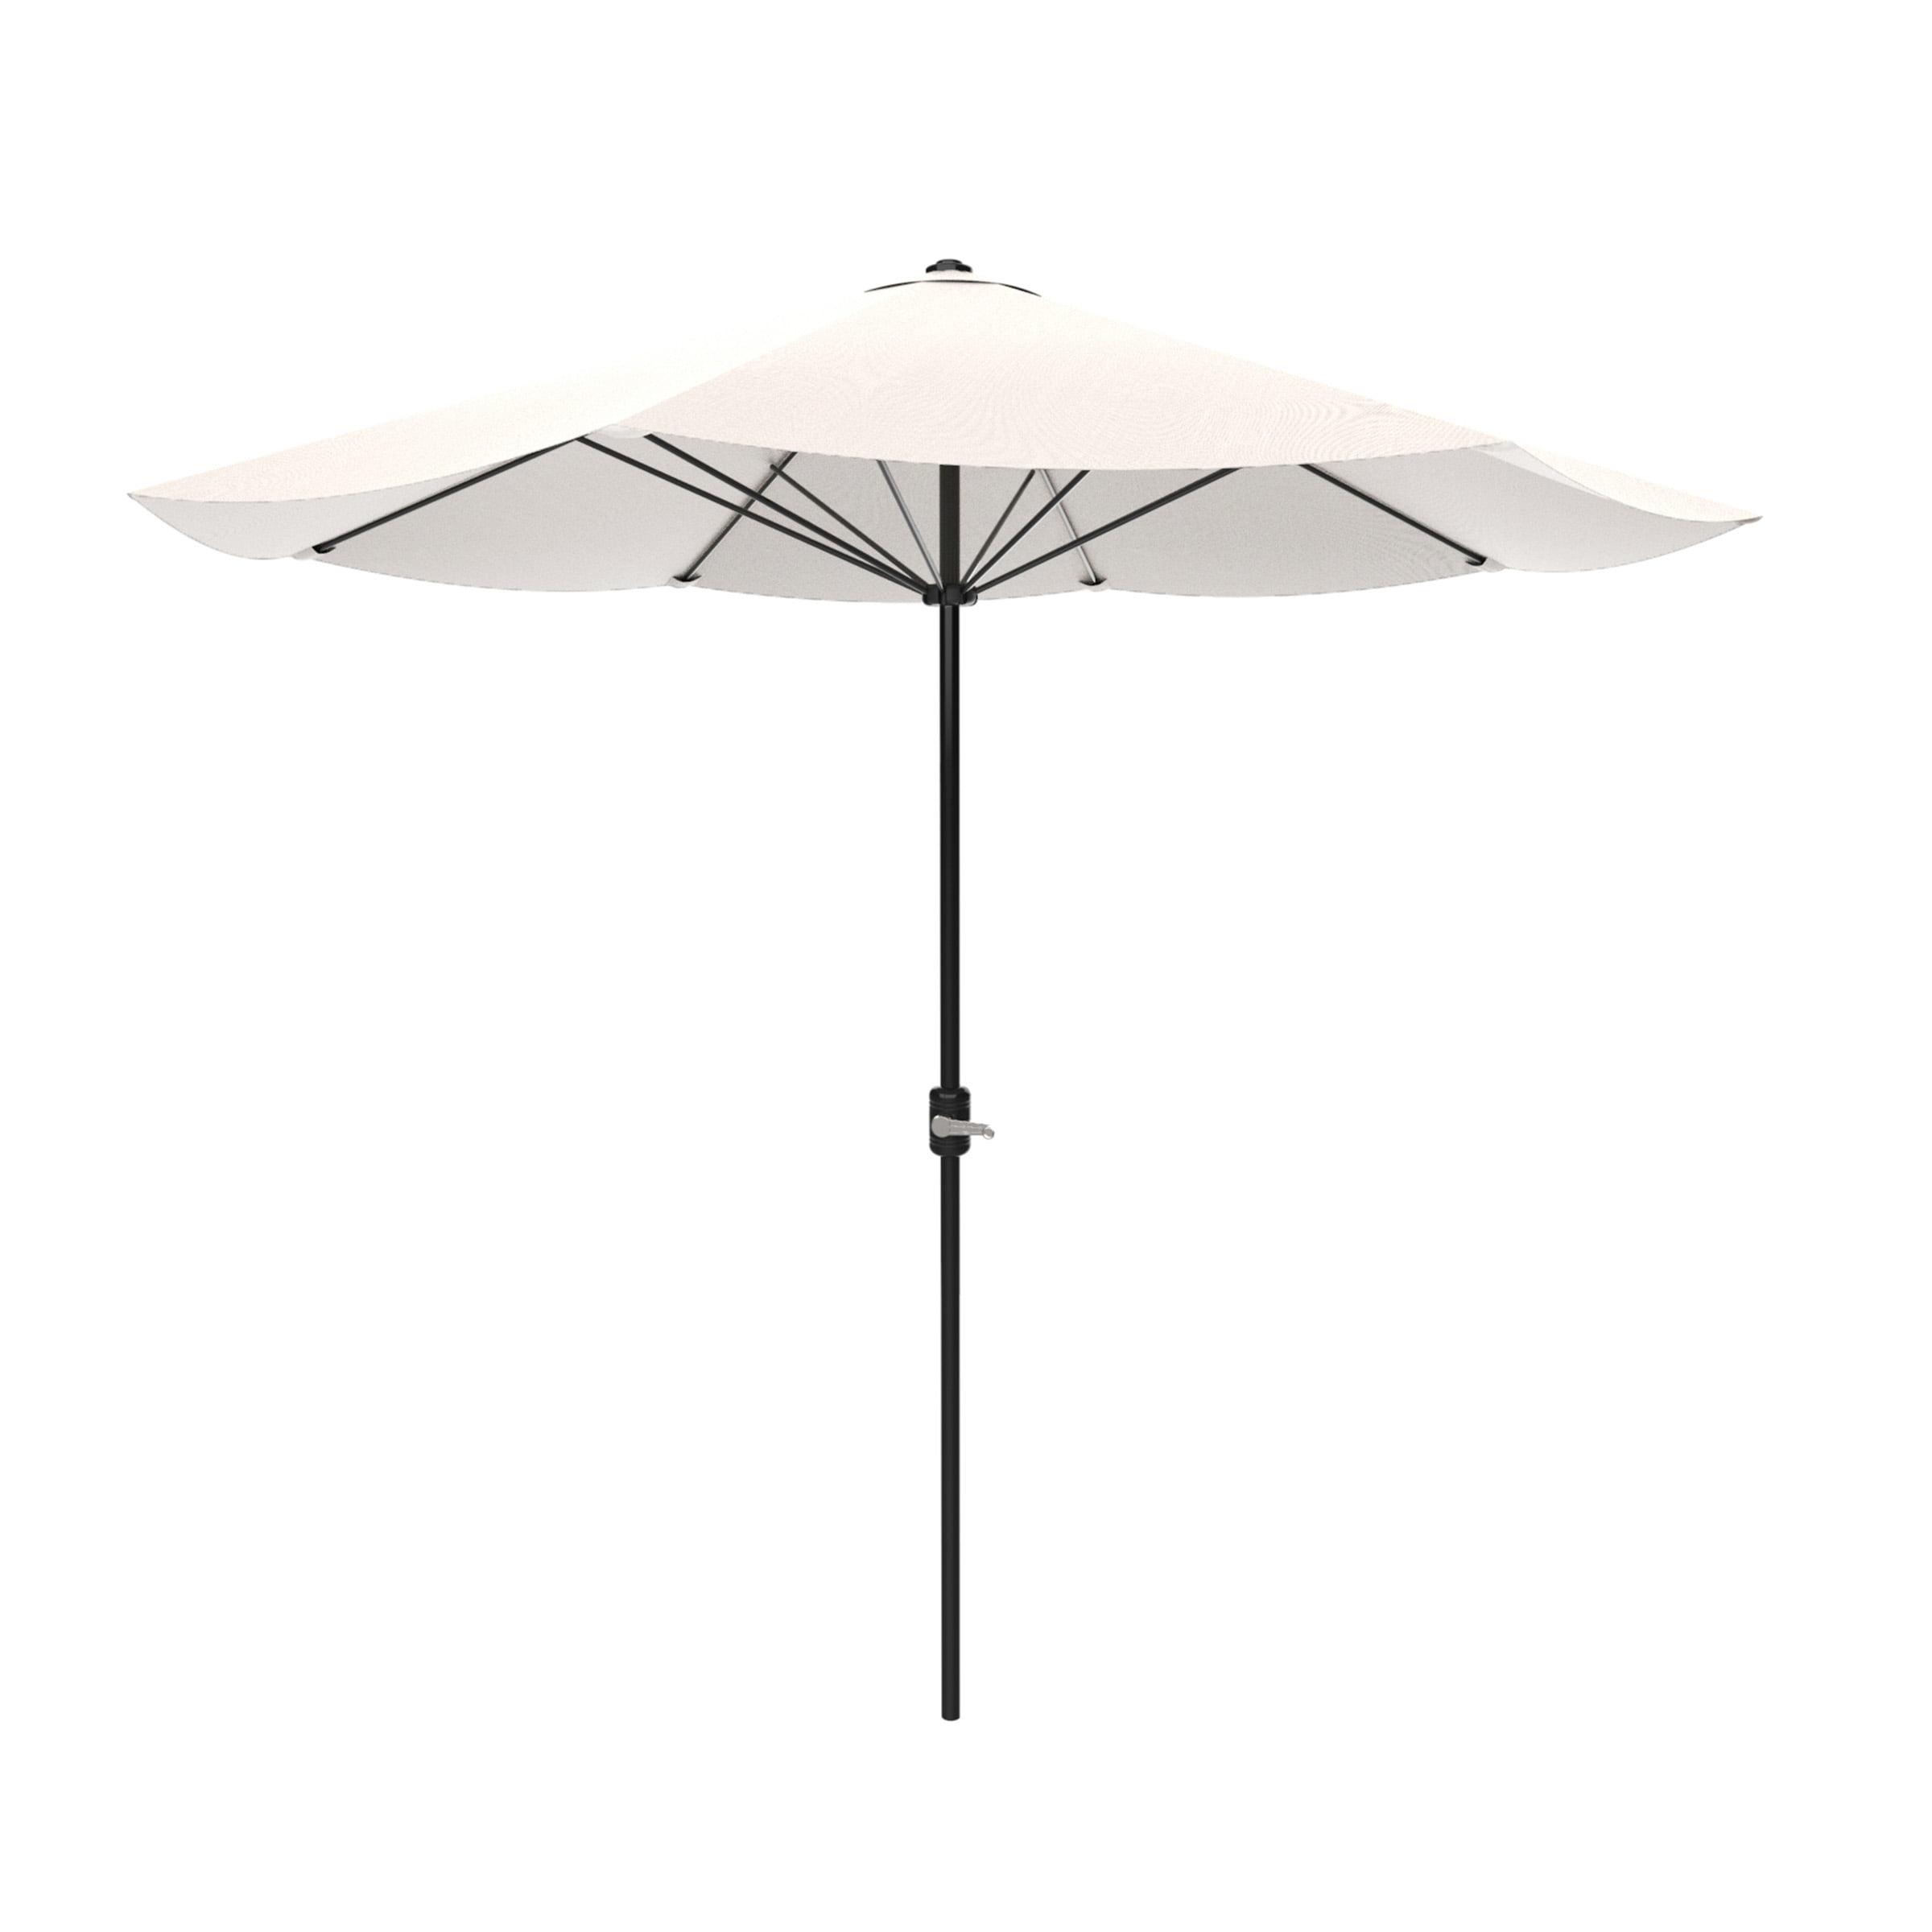 Patio Umbrella, Outdoor Shade with Easy Crank- Table Umbrella for Deck, Balcony, Porch,... by Trademark Global LLC